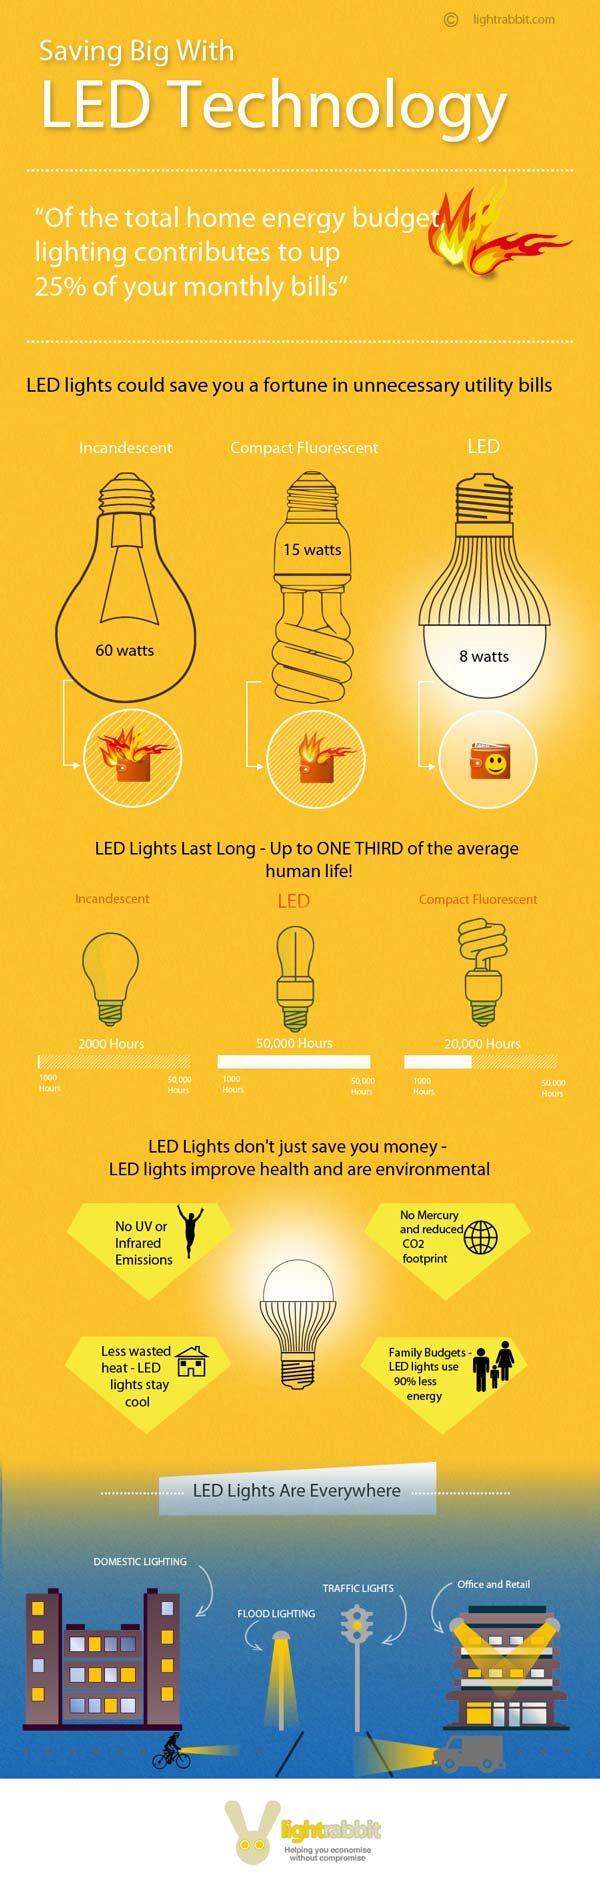 Saving Big With LED Technology